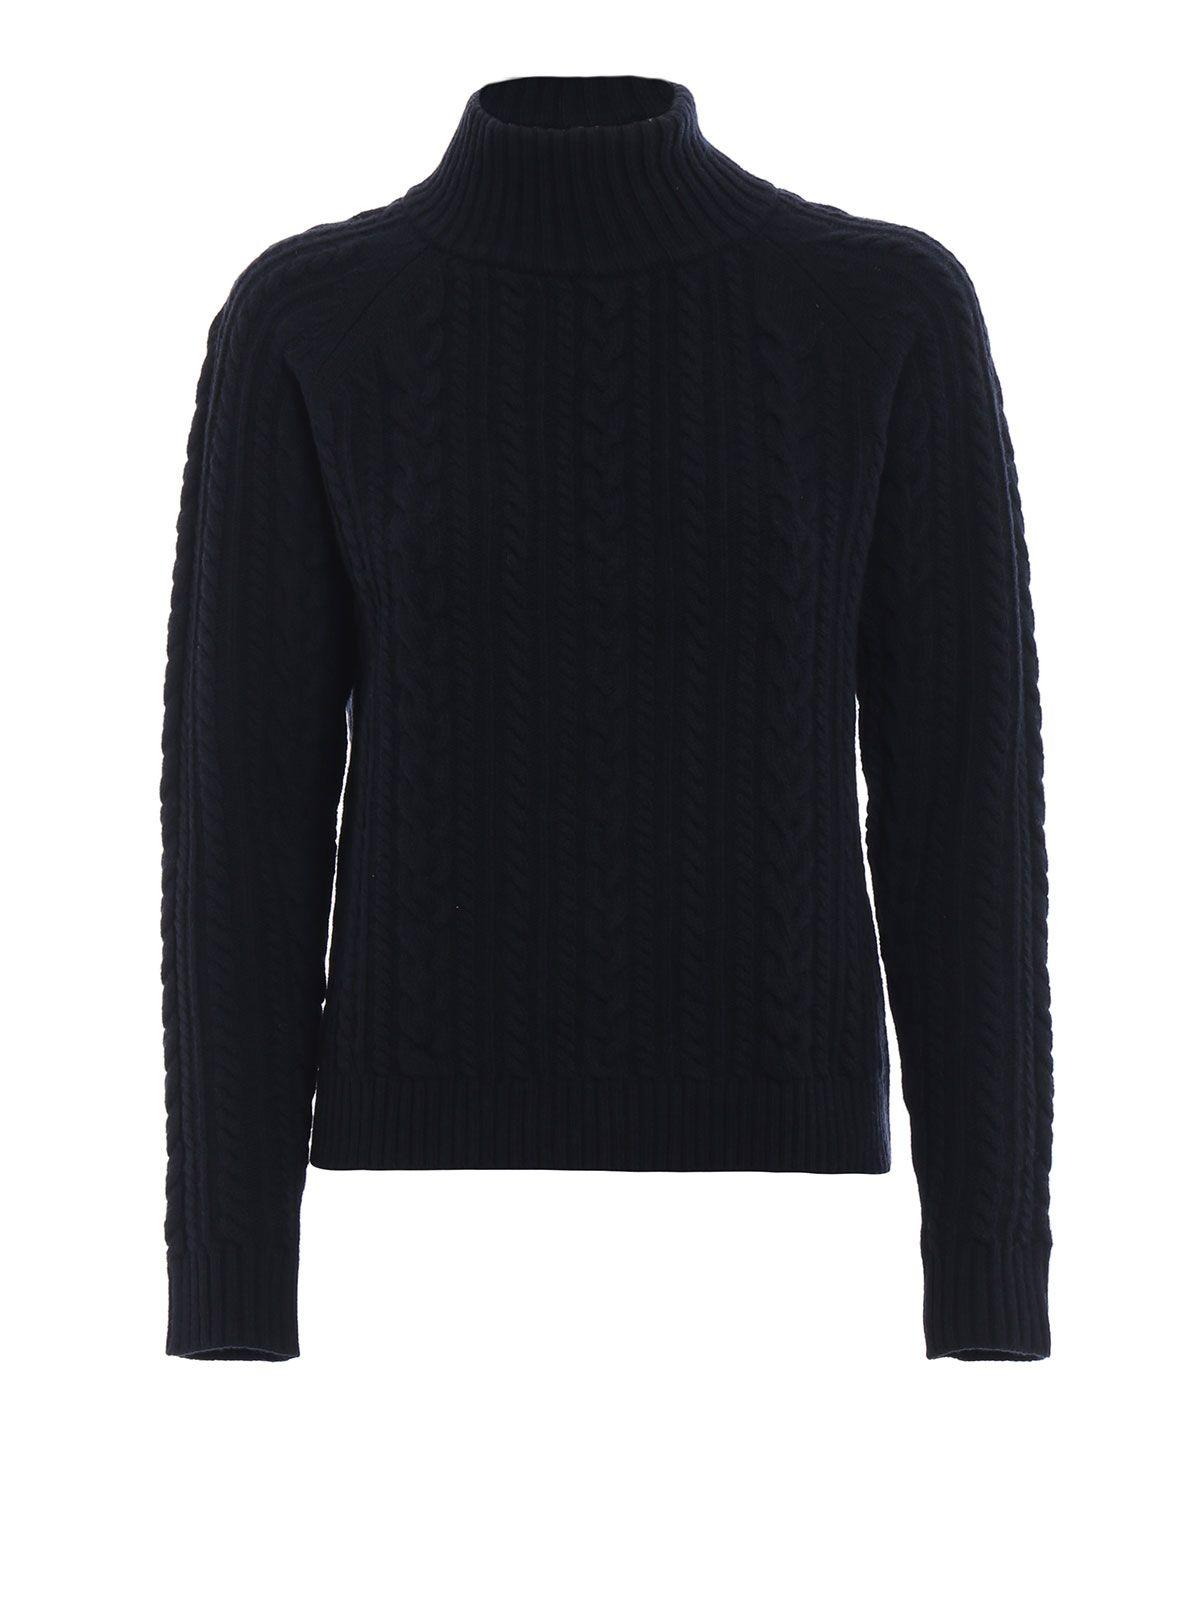 max mara - Brando Dark Blue Braided Wool Turtleneck